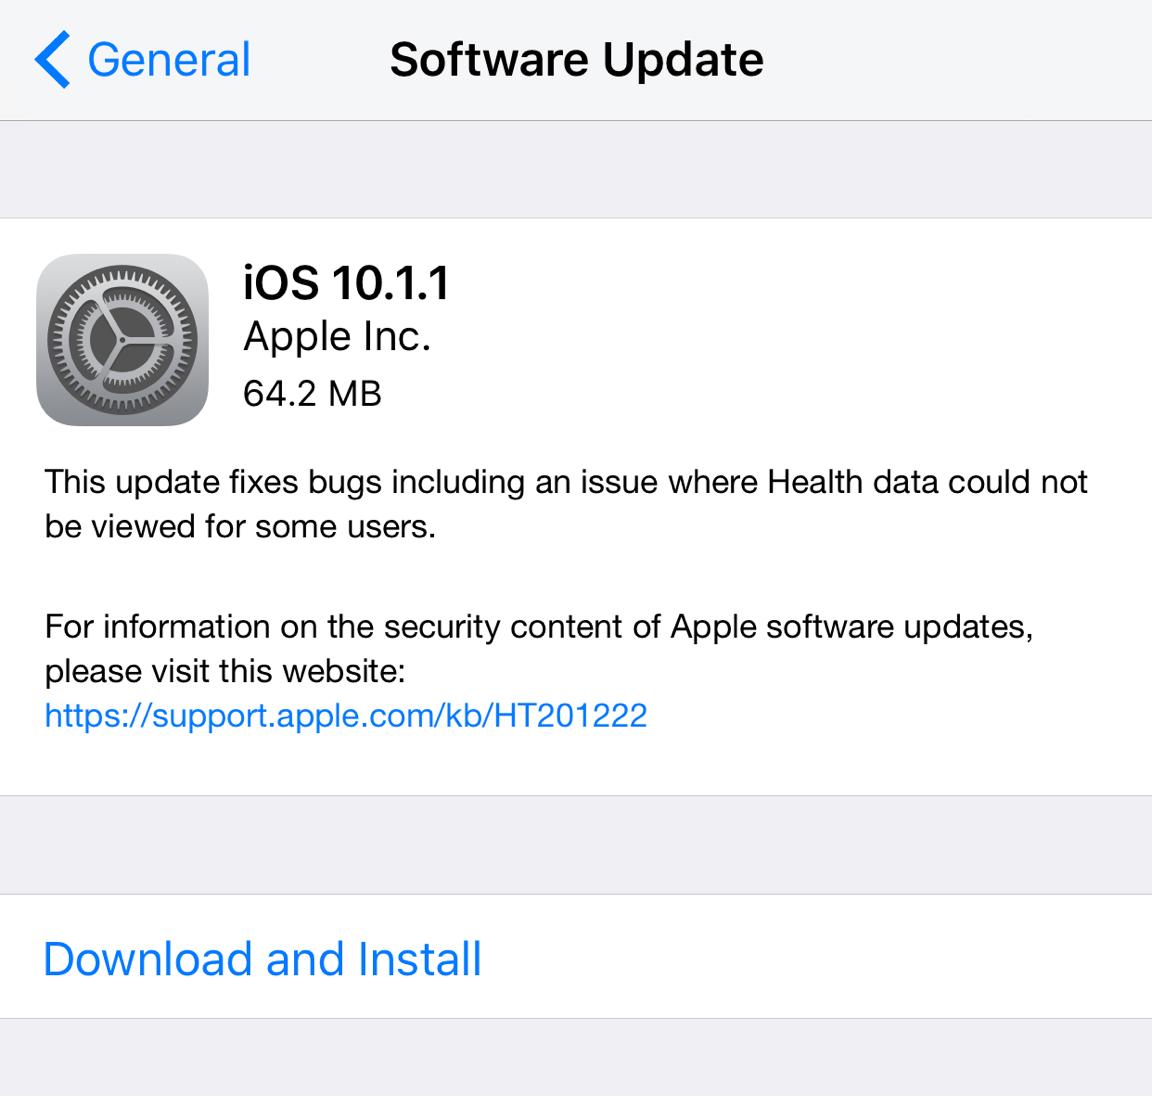 iOS 10.1.1 Health Data Fix